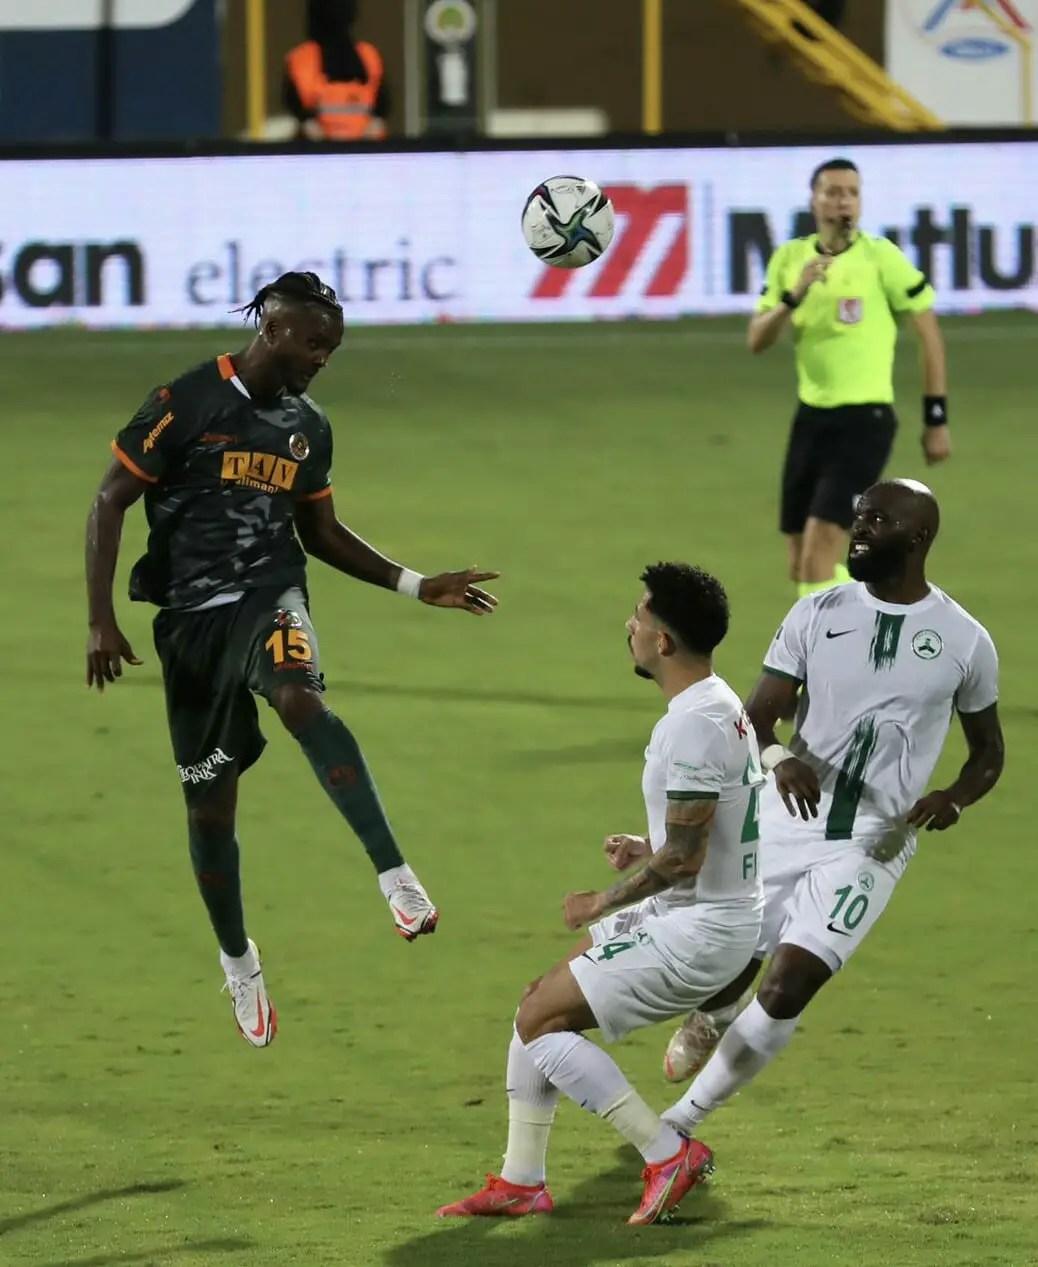 Eagles Round-up:Awaziem Marks Alanyaspor Debut With Winning Goal; Iwobi Subbed On As Everton Beat Burnley